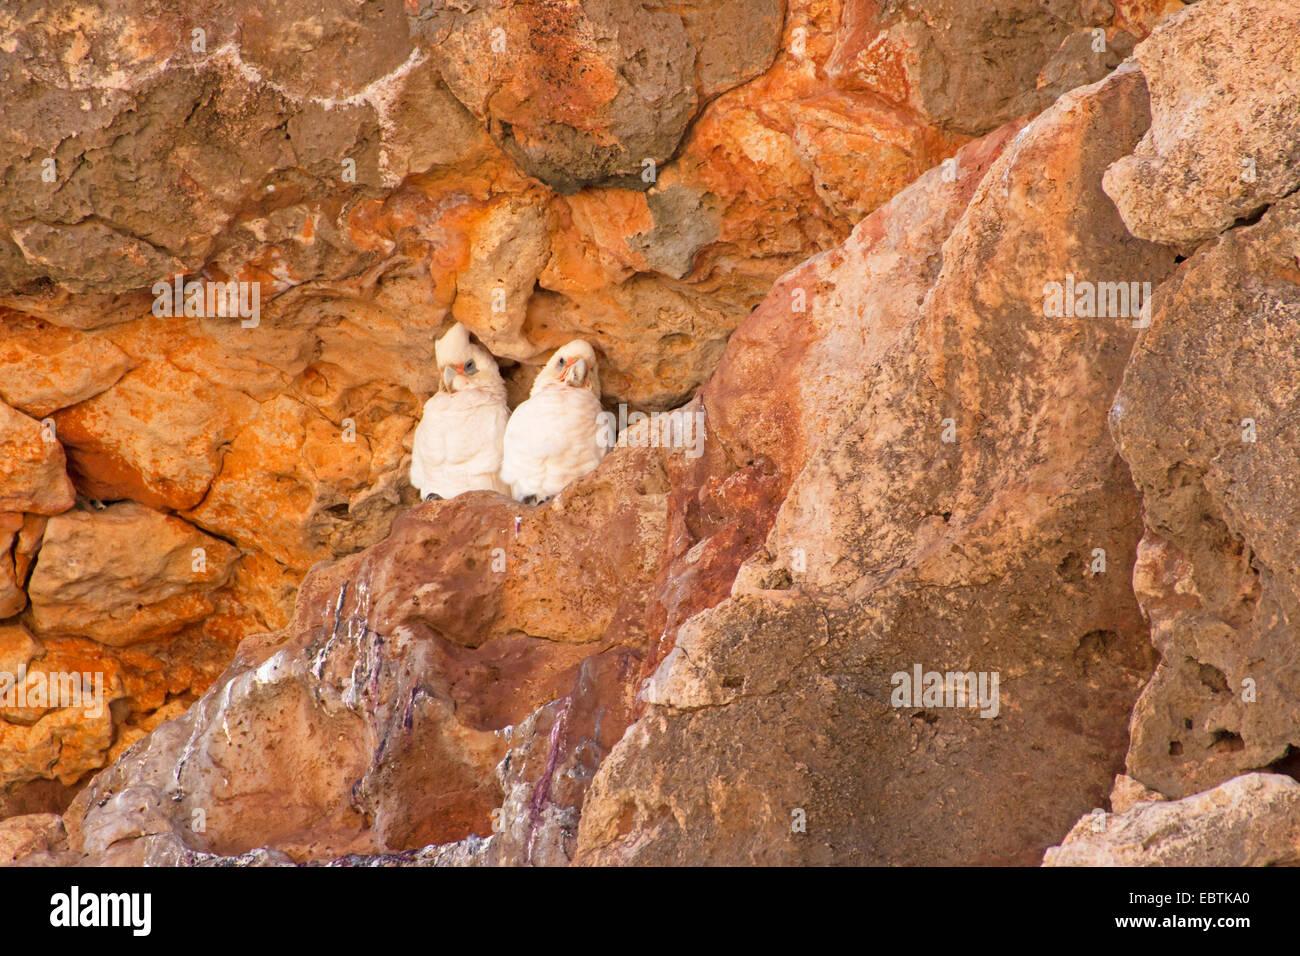 little corella (Cacatua sanguinea), pair in the nest, Australia, Western Australia, Cape Range National Park - Stock Image